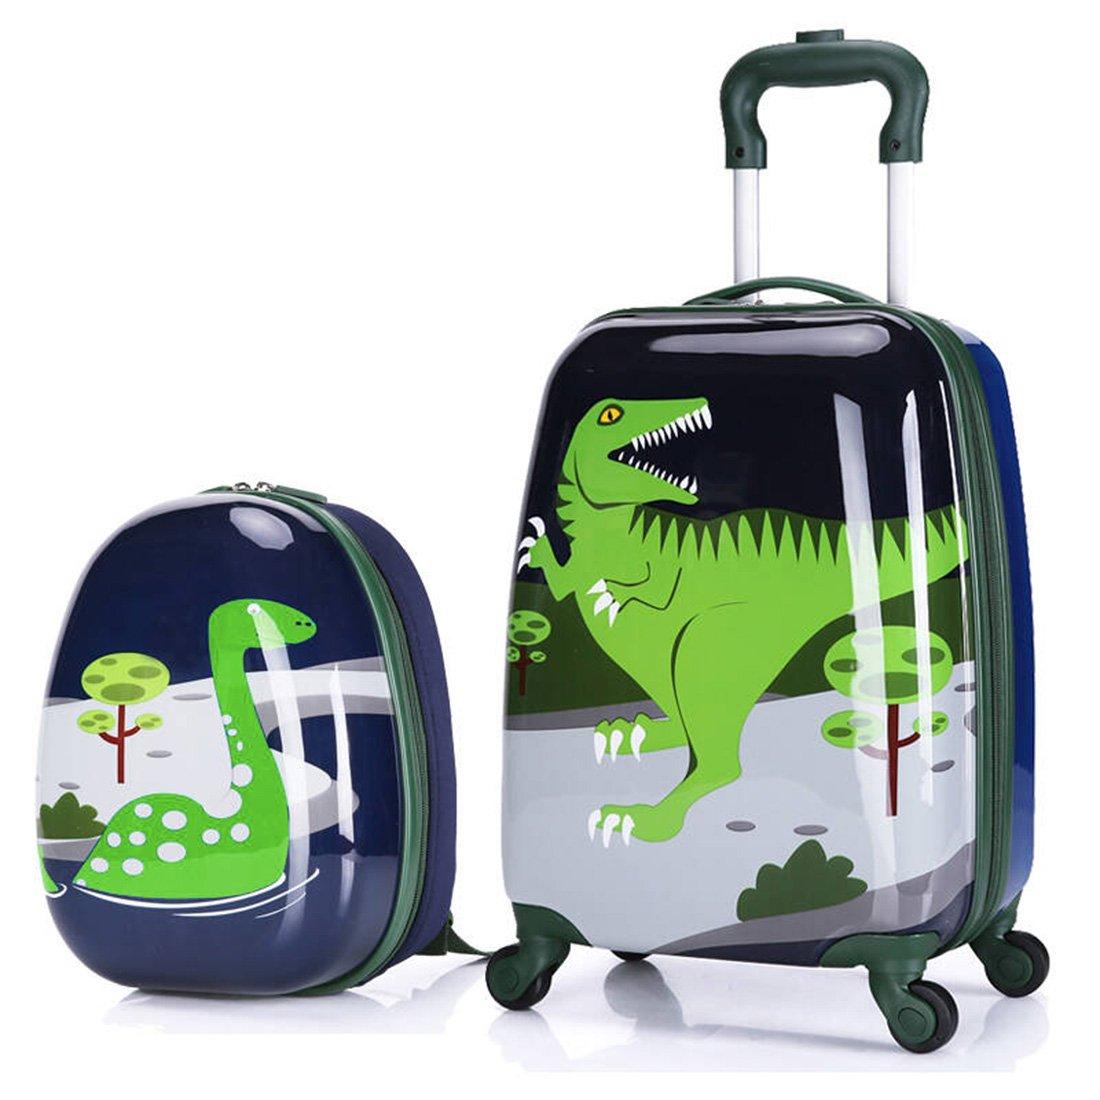 MOREFUN 2 Pcs Kids Travel Luggage Set 18'' Carry on Luggage and 13'' Backpack (dinosaur)